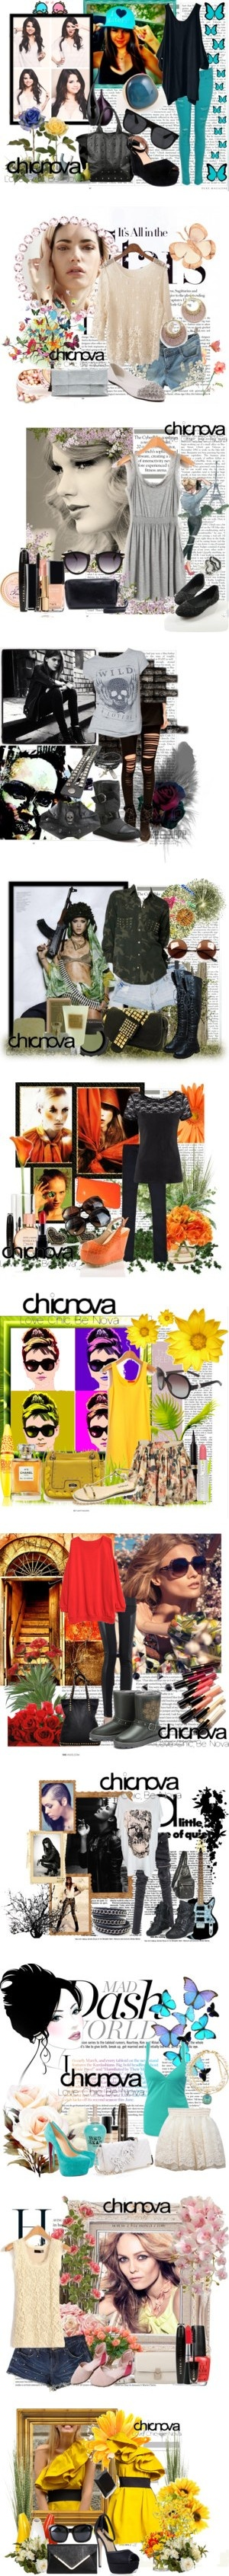 """www.chicnova.com"" by sanja90 ❤ liked on Polyvore"